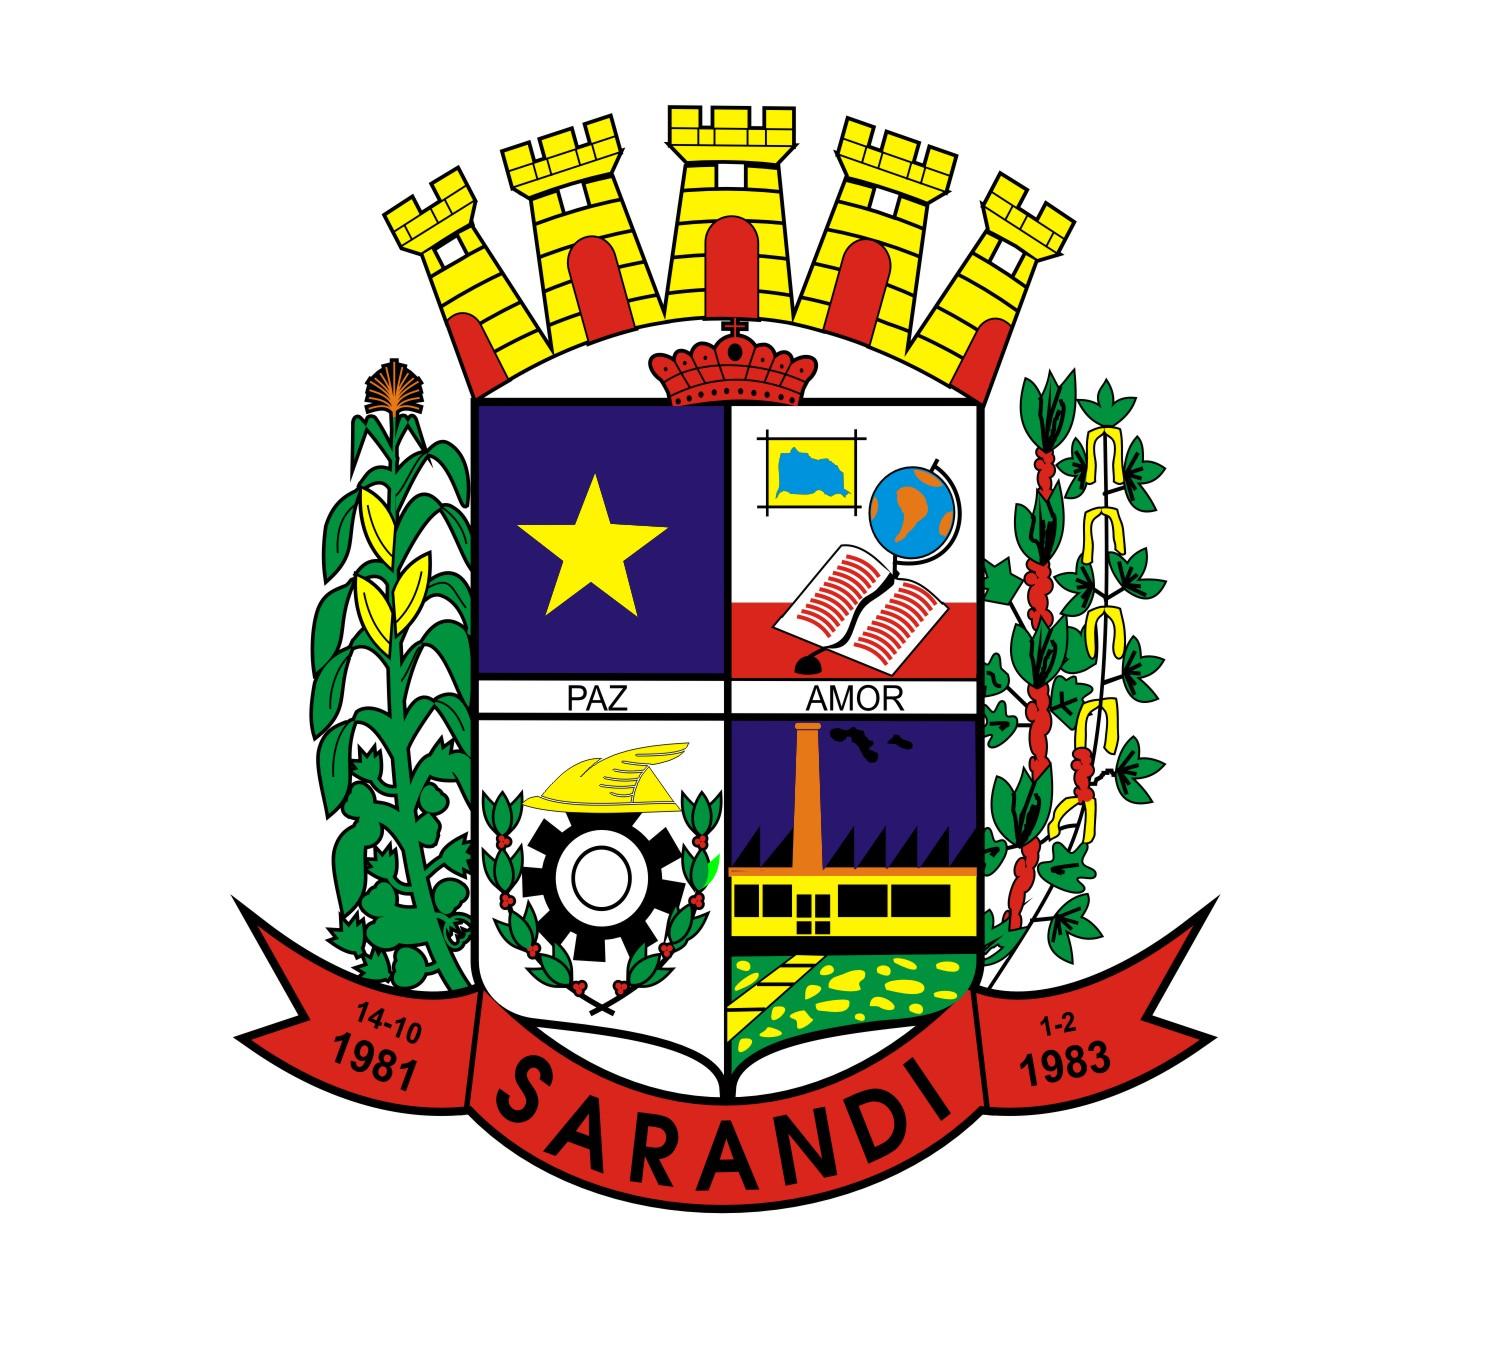 A lei de improbidade administrativa aplicada aos prefeitos 4